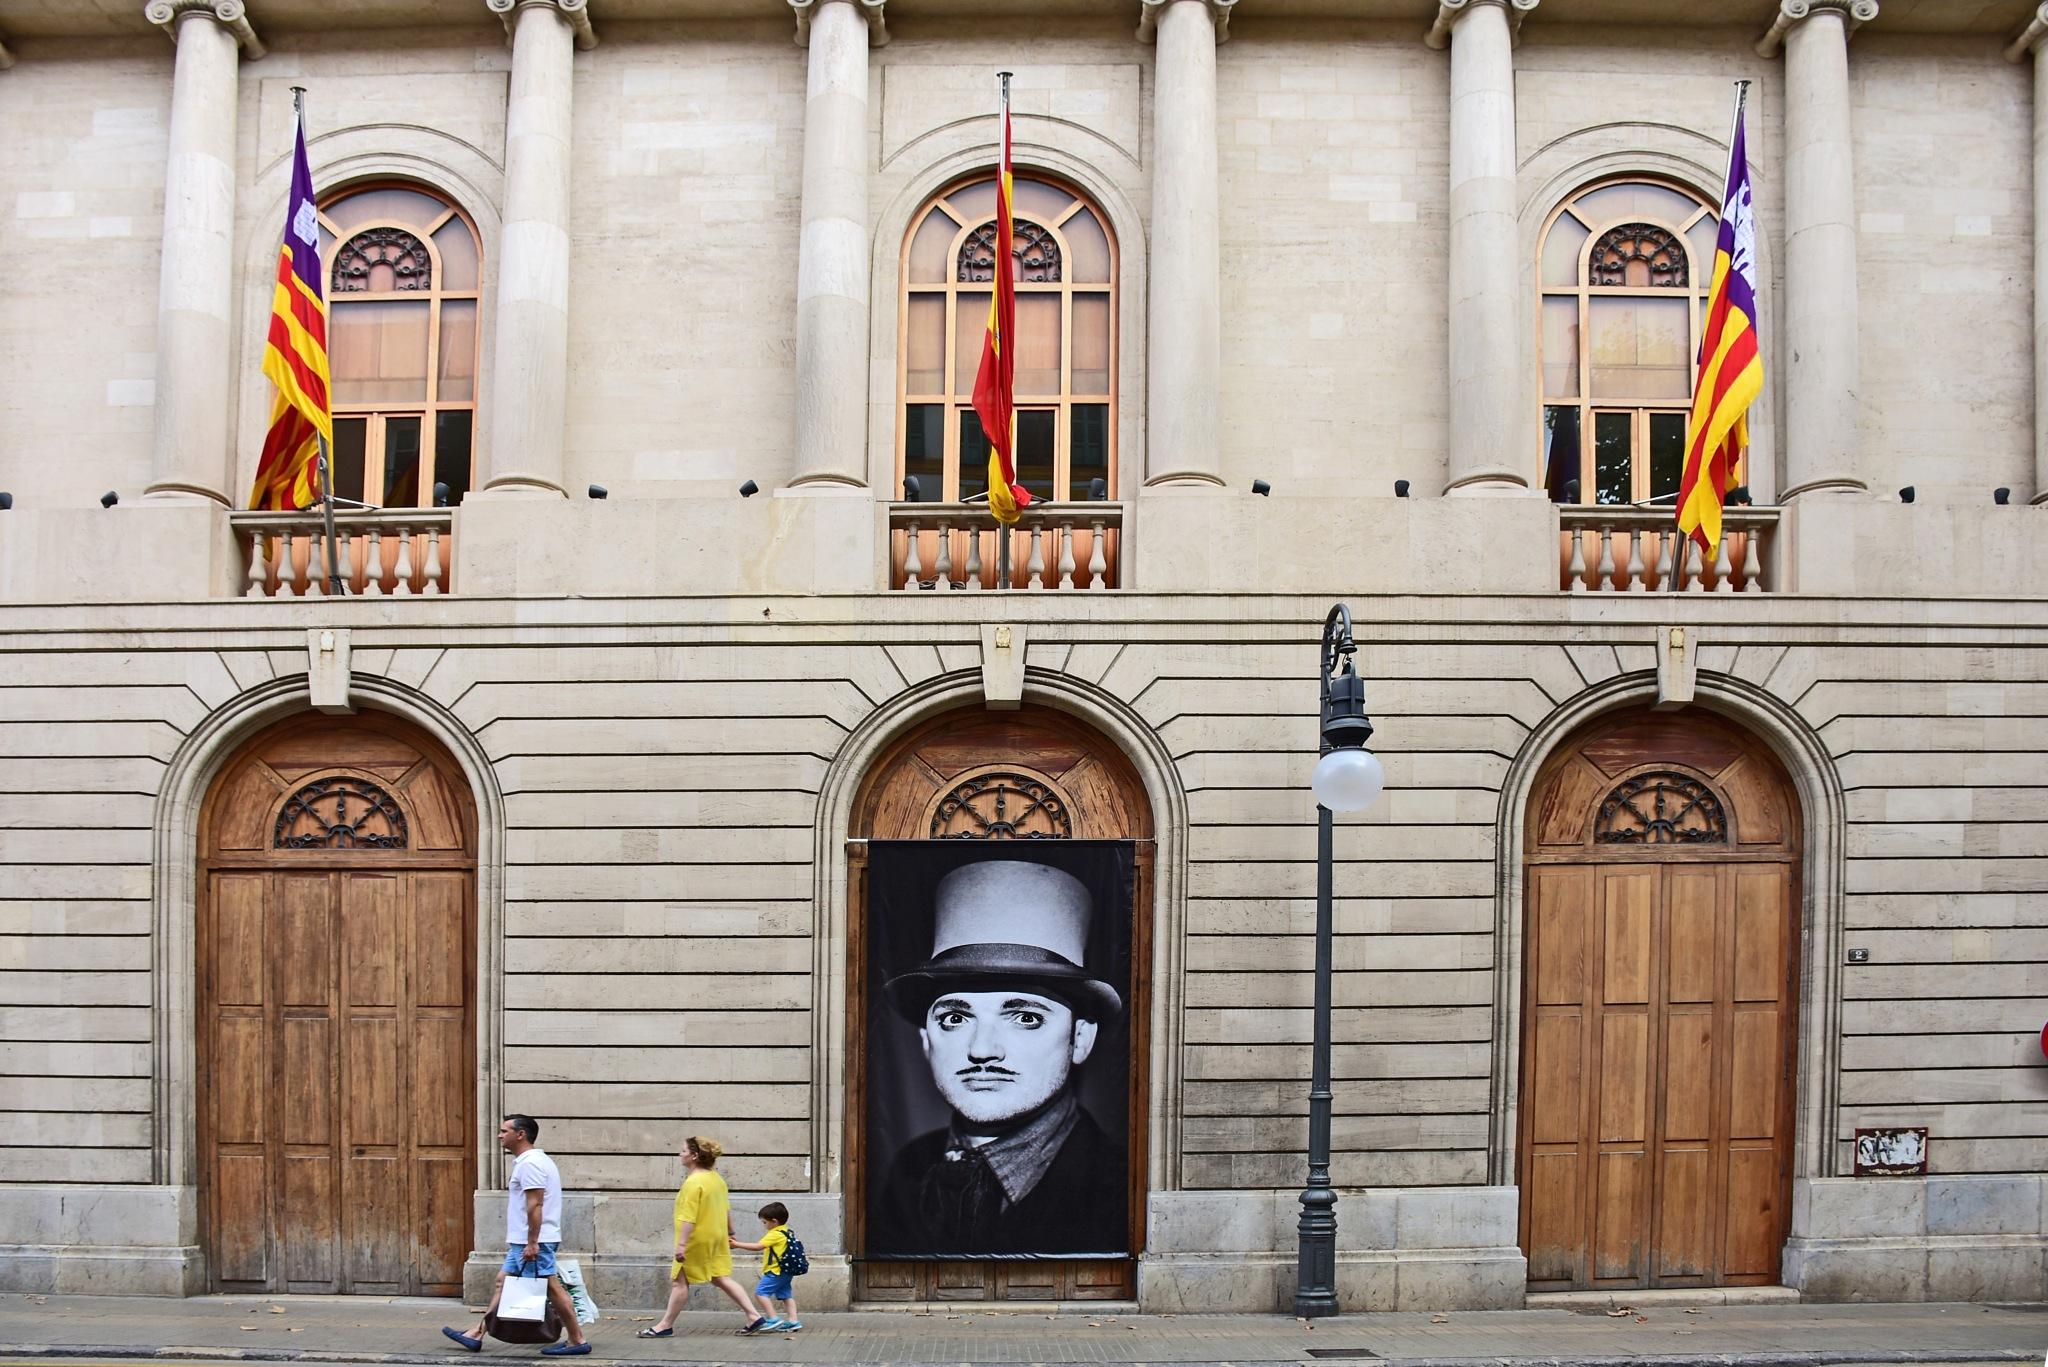 Spanish street scene with portrait by liwesta